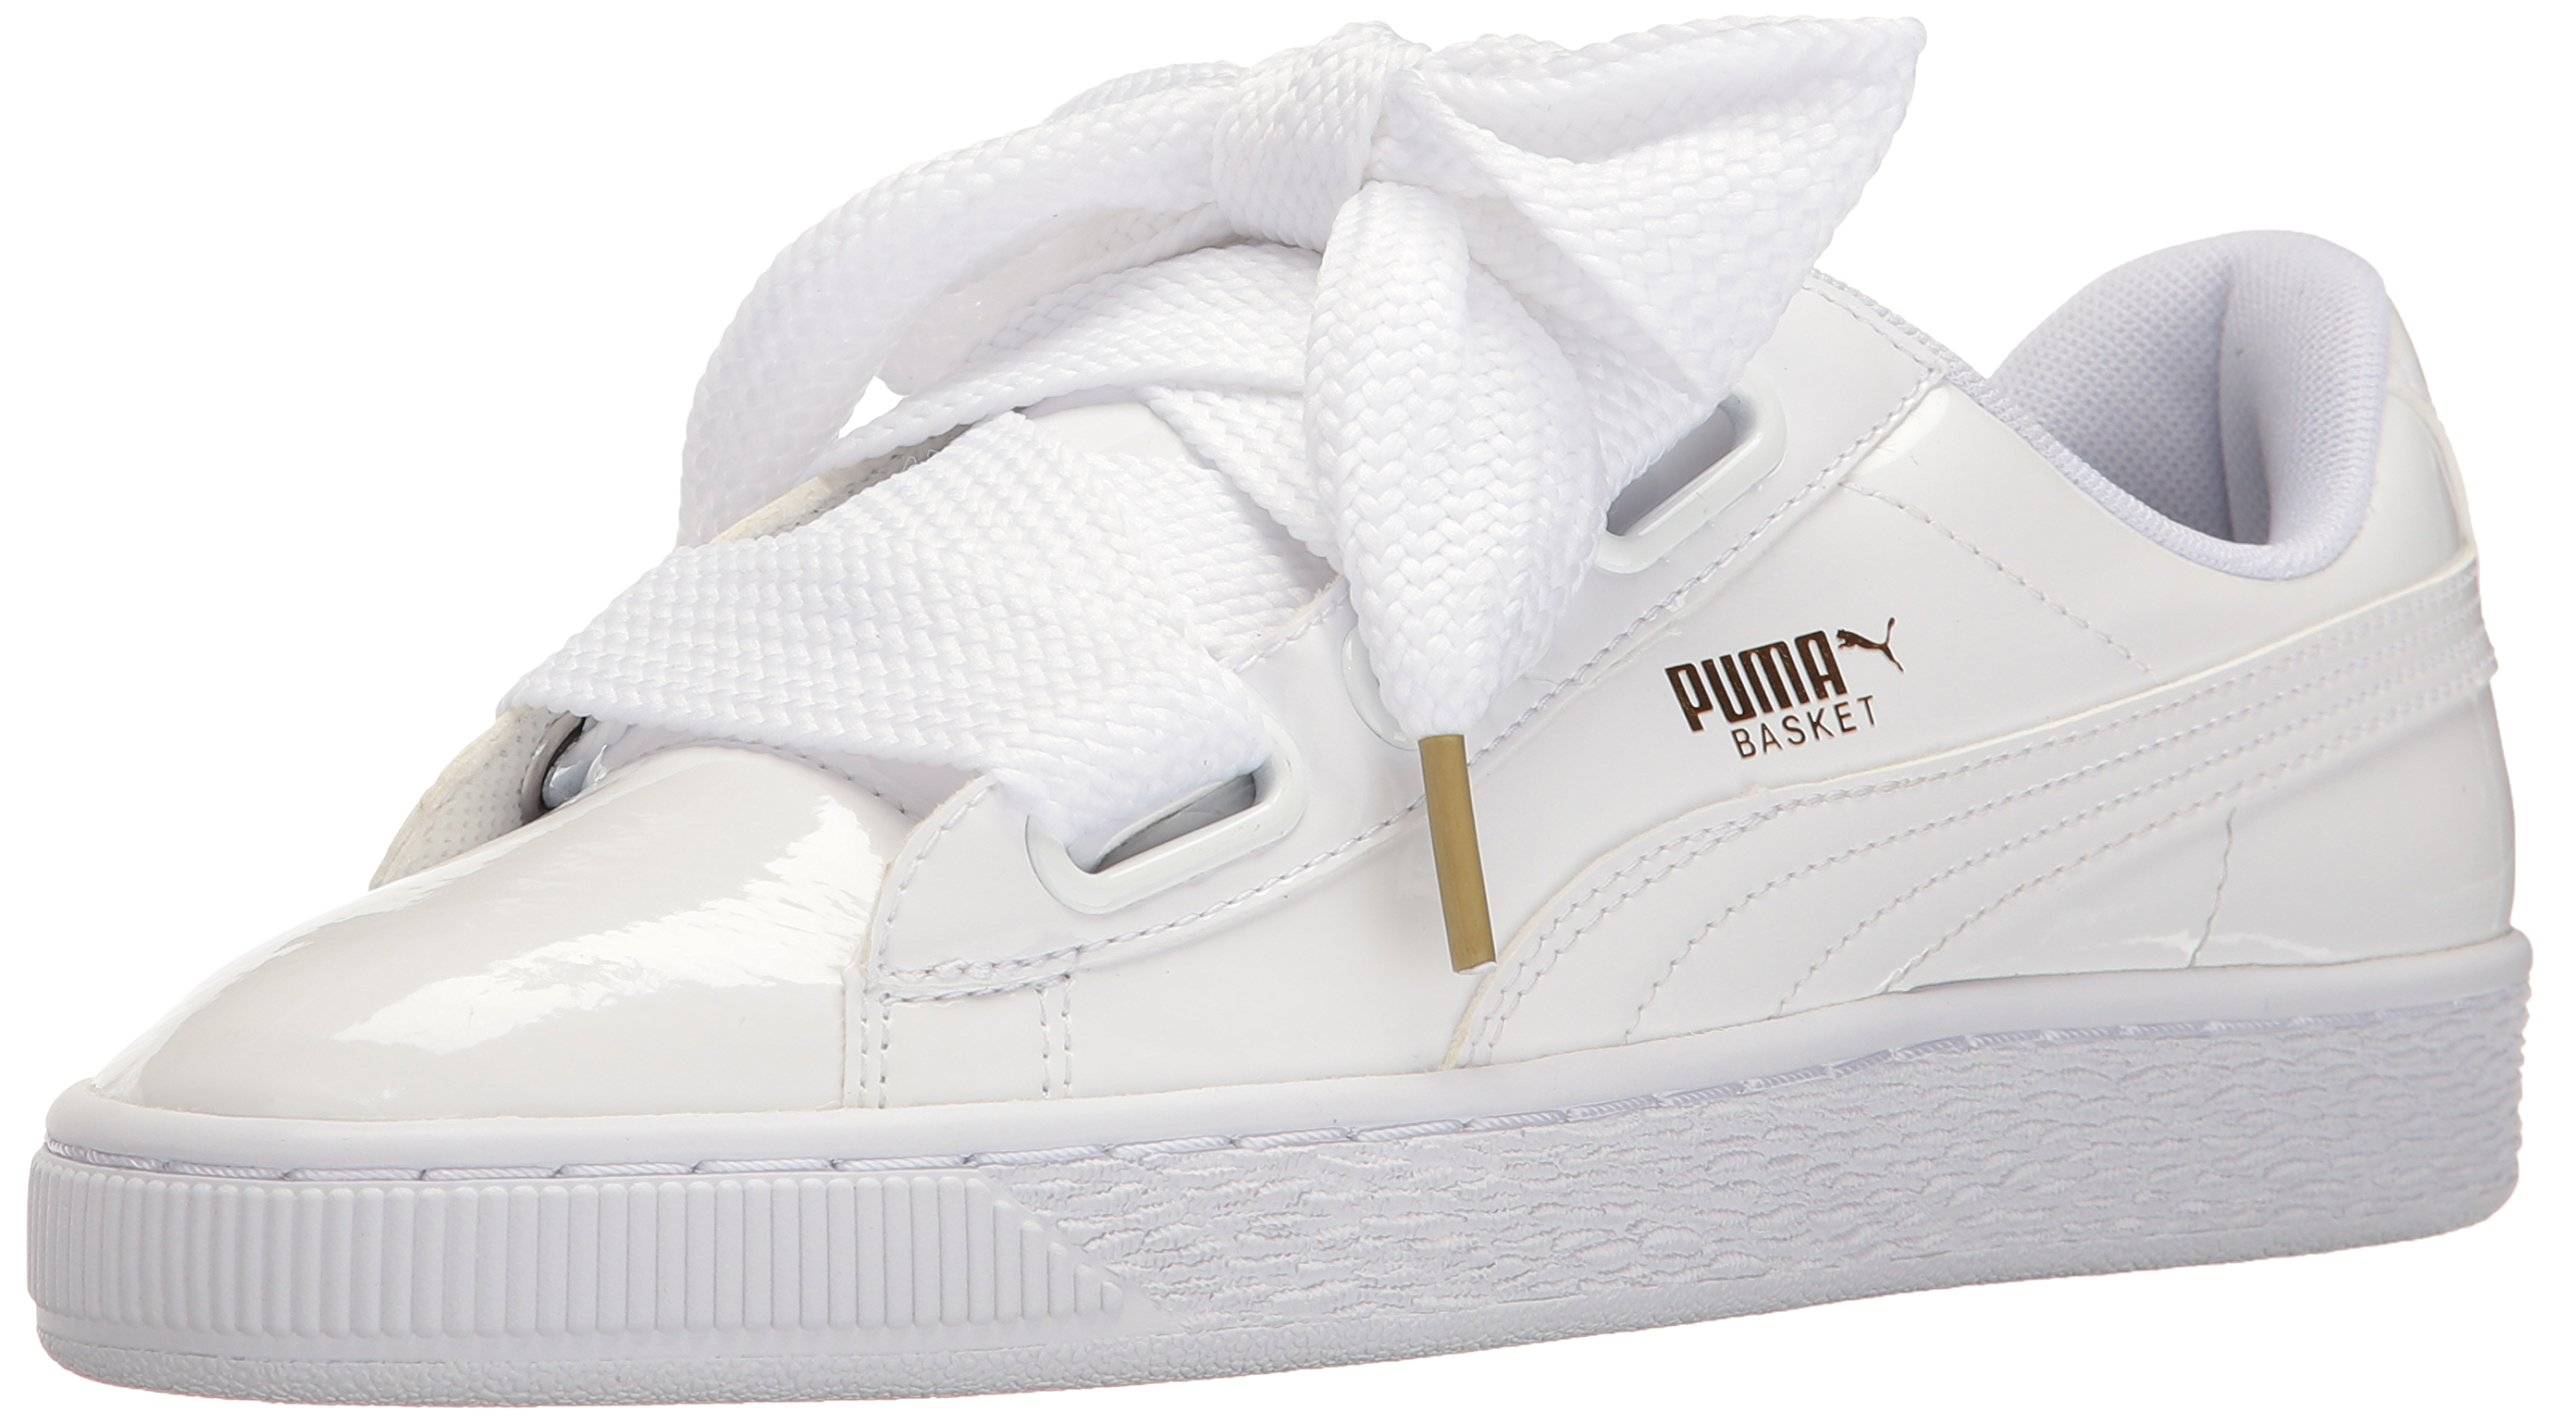 pretty nice 41546 d1302 PUMA Women's Basket Heart Patent WN's Sneaker White, 9.5 M US